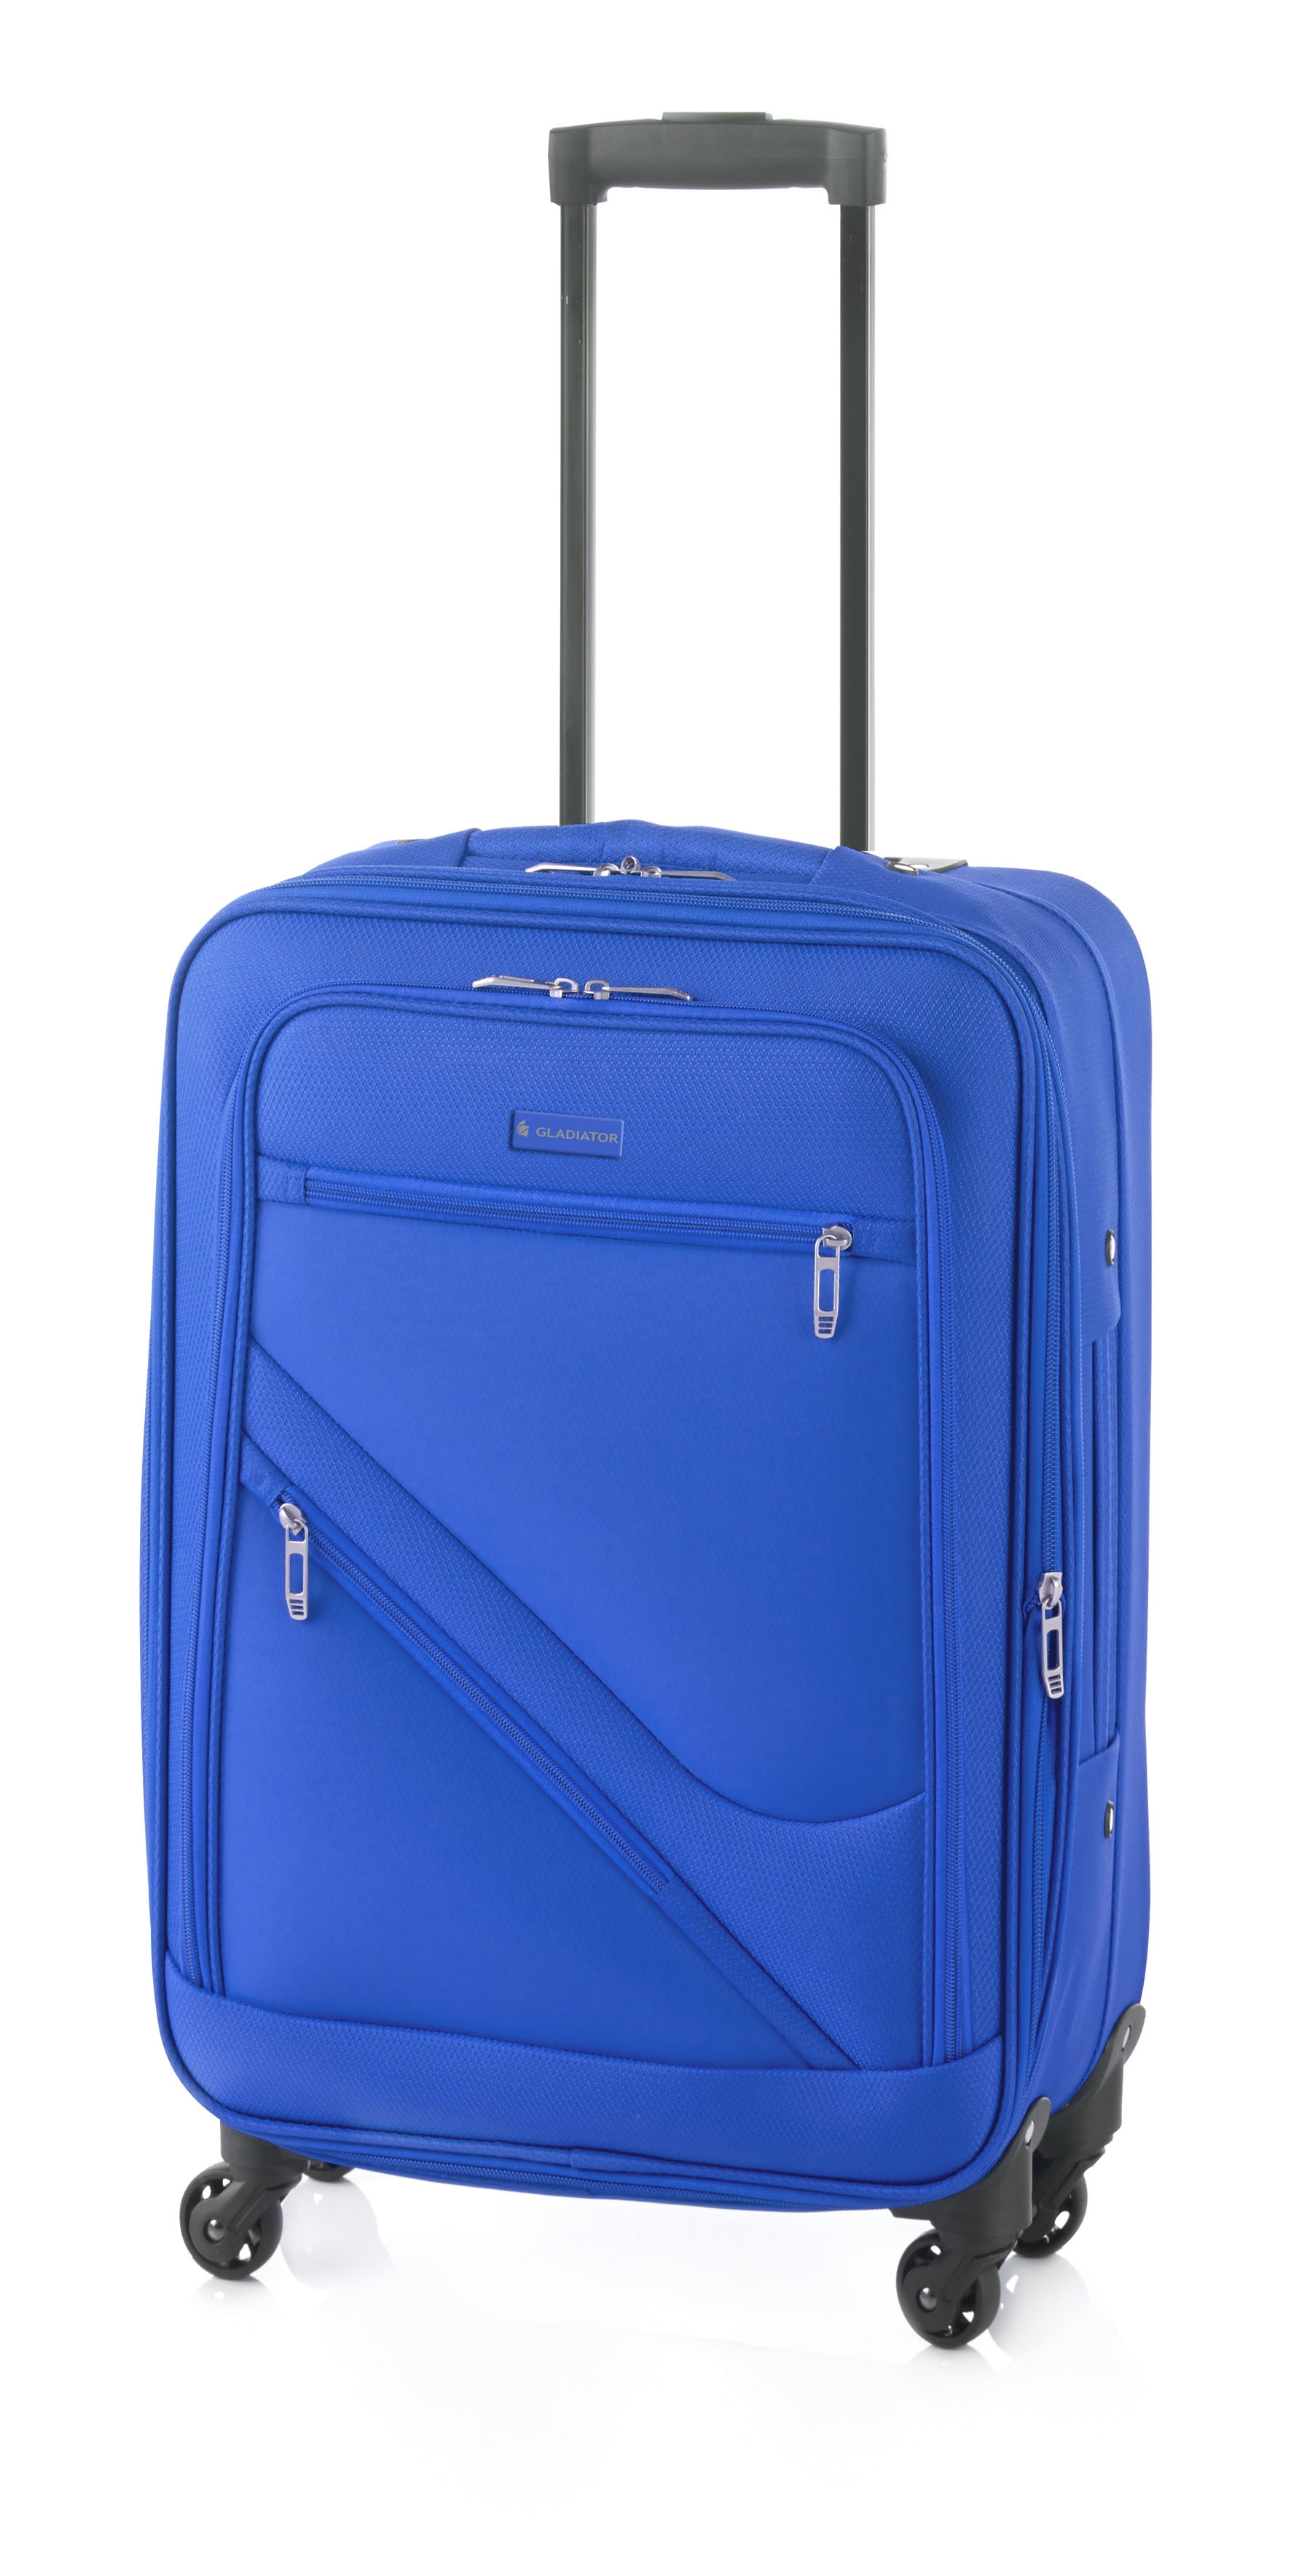 Gladiator Timelapse maleta mediana 4R expandible azul